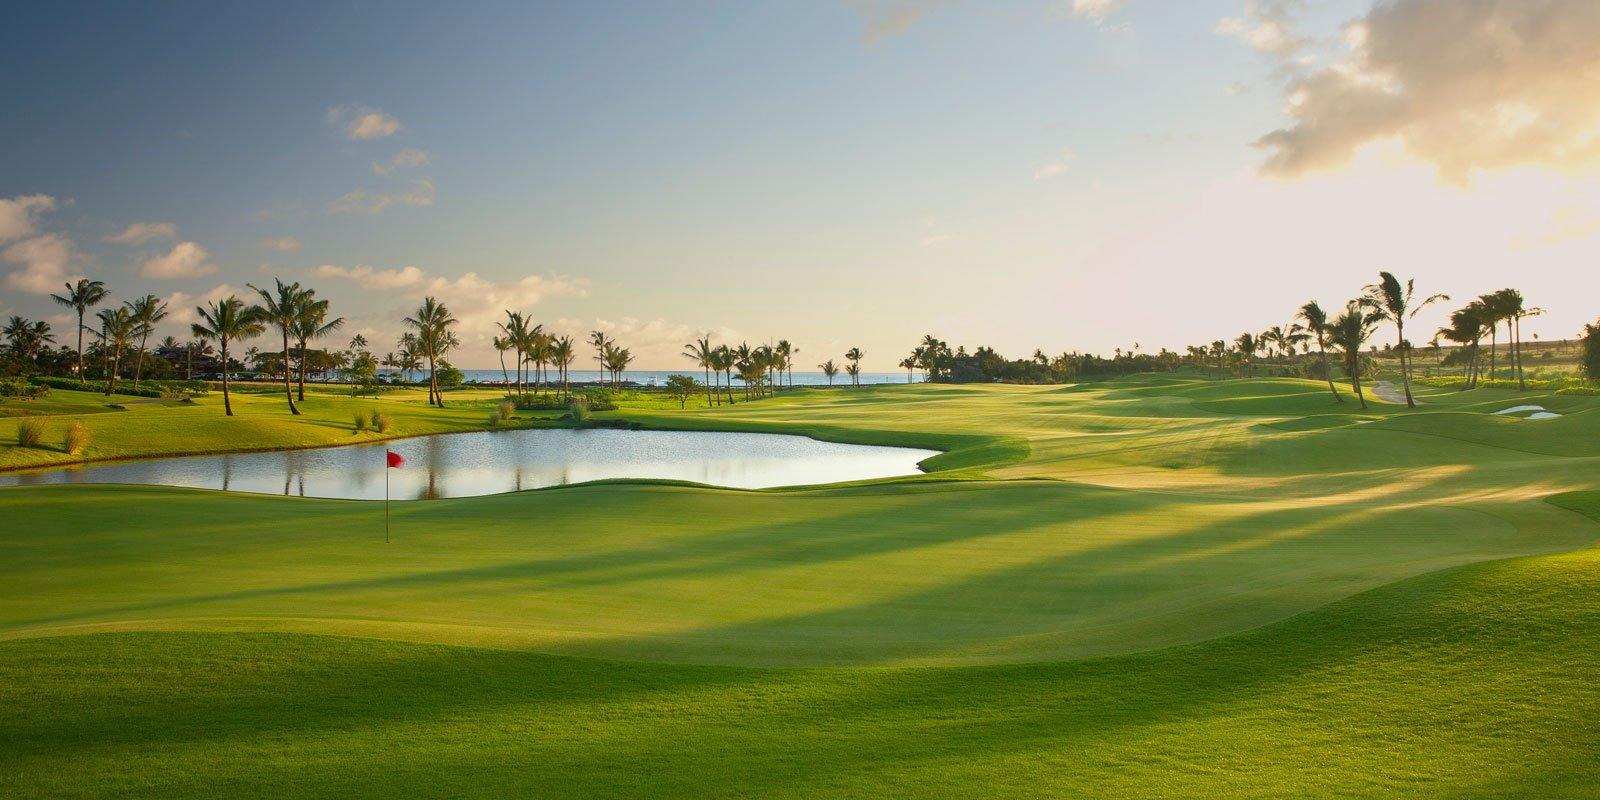 Postcard-Perfect Golf - Kukui'ula